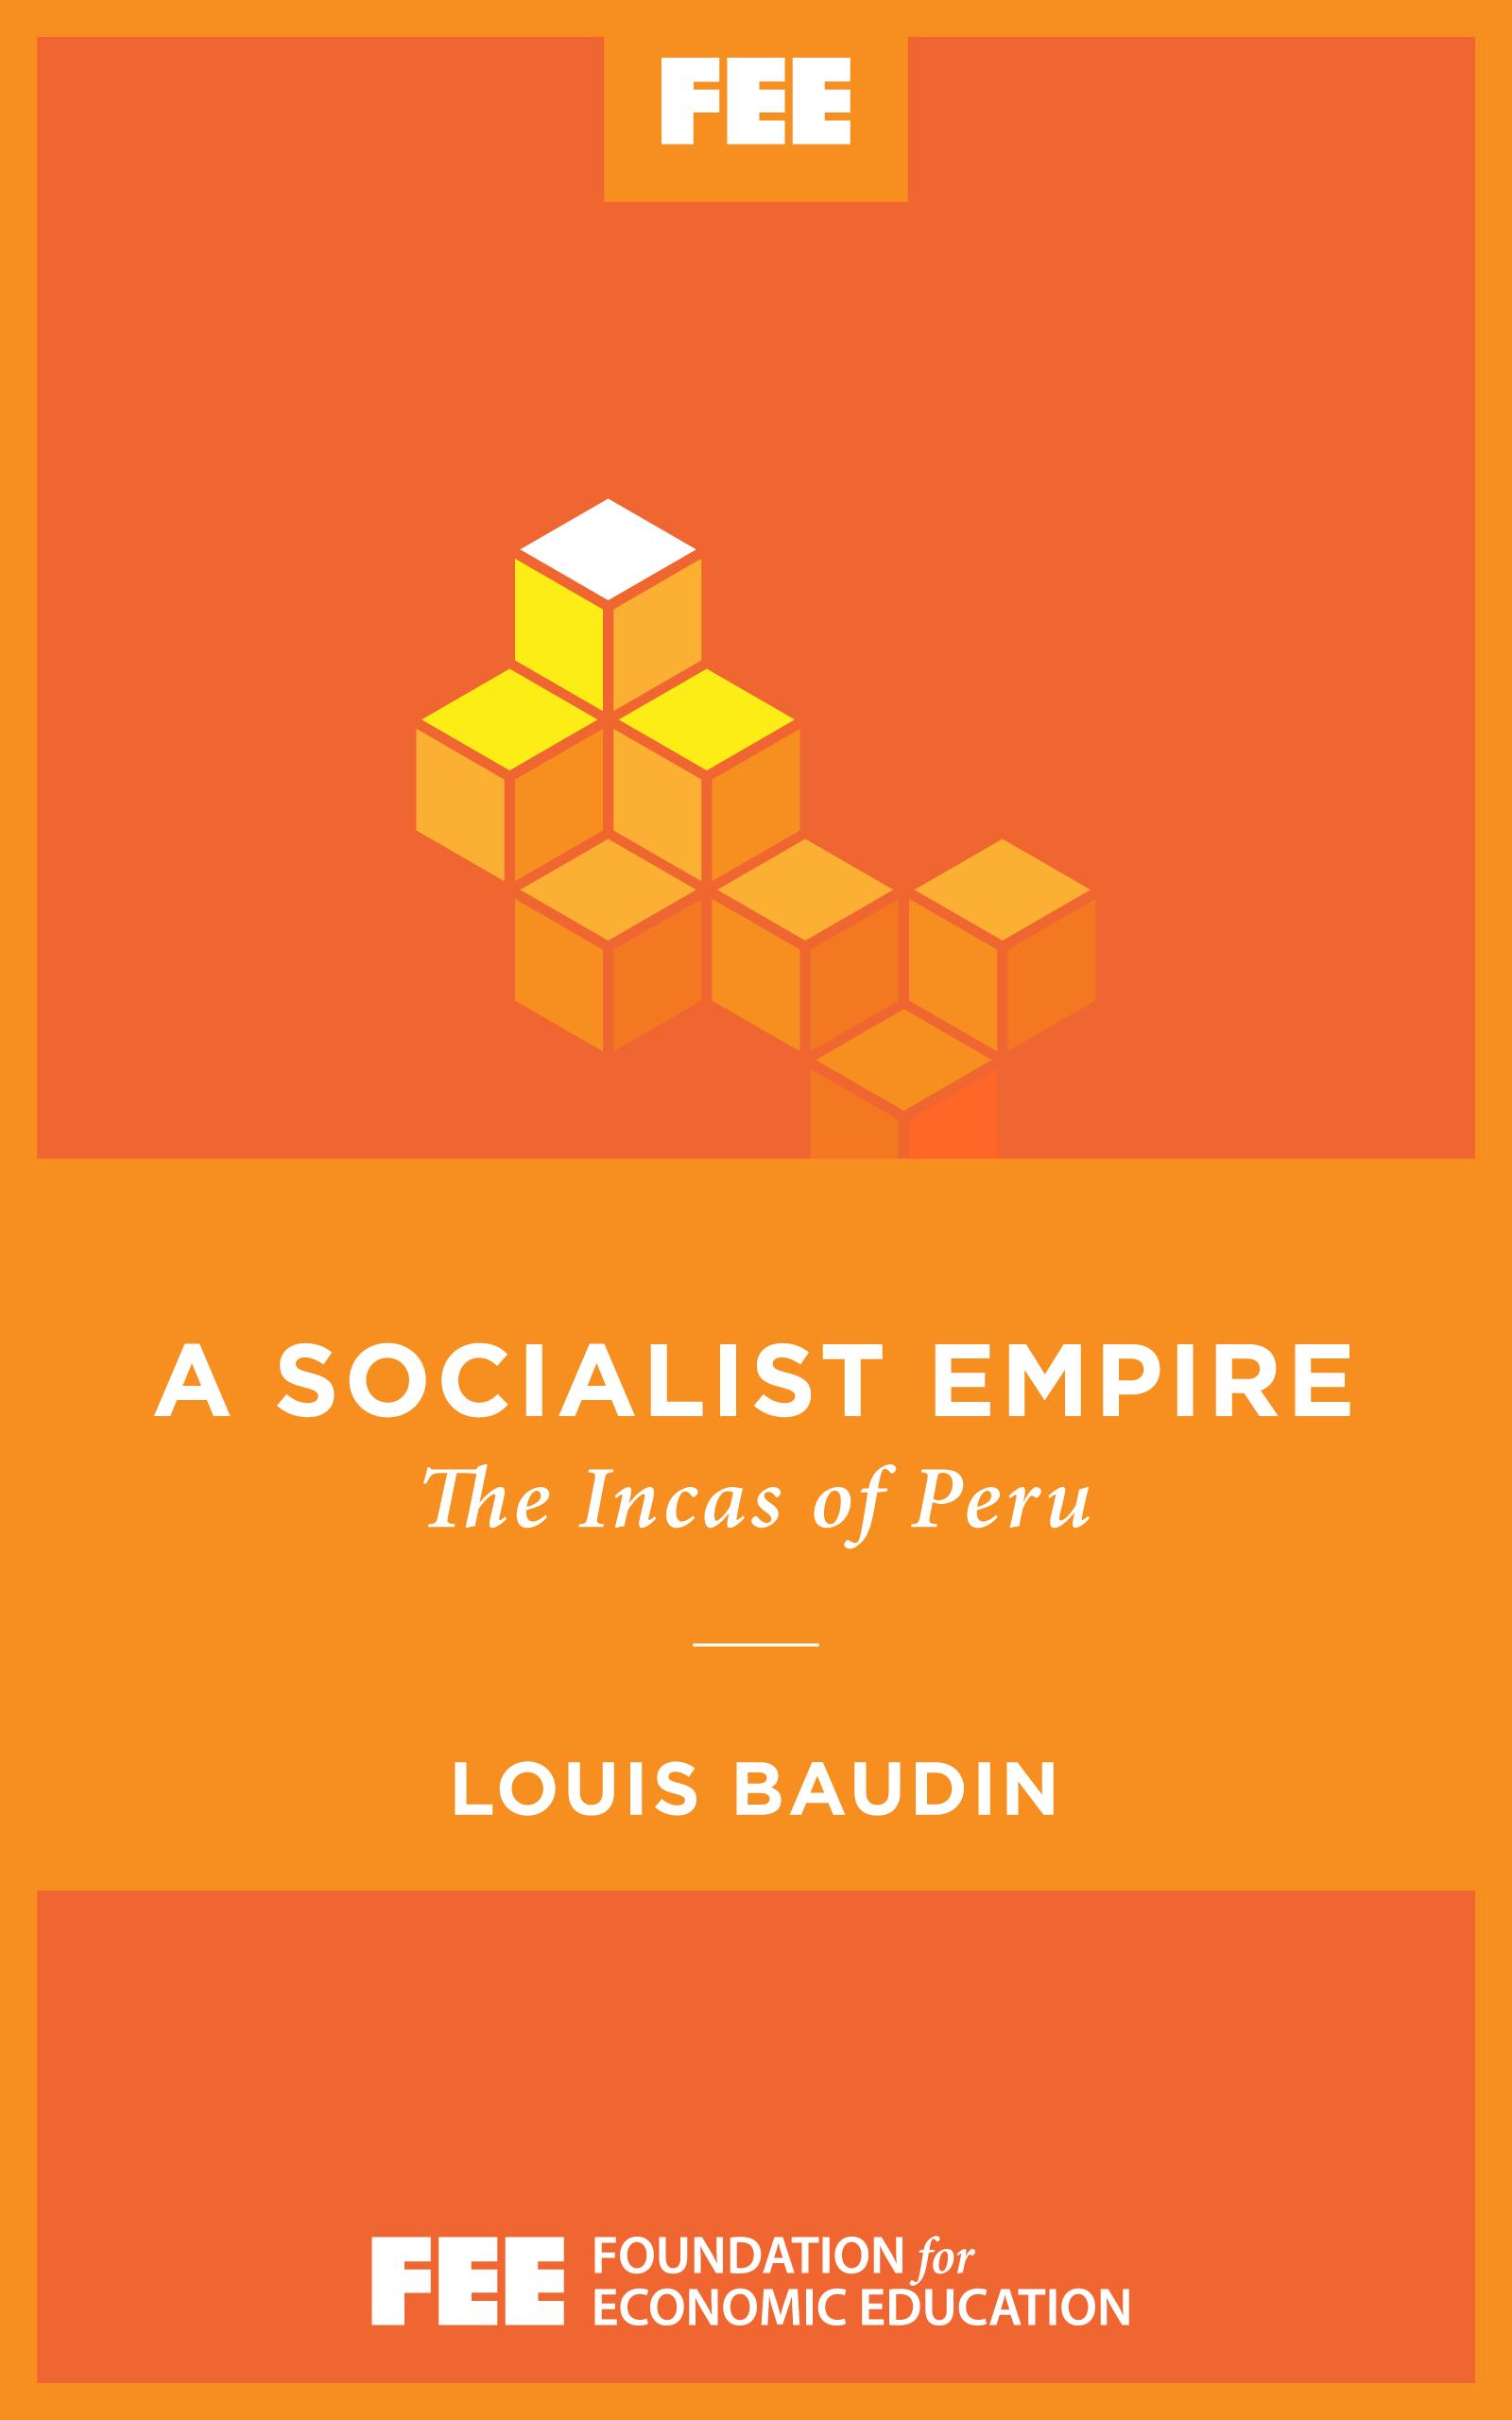 principles of socialism